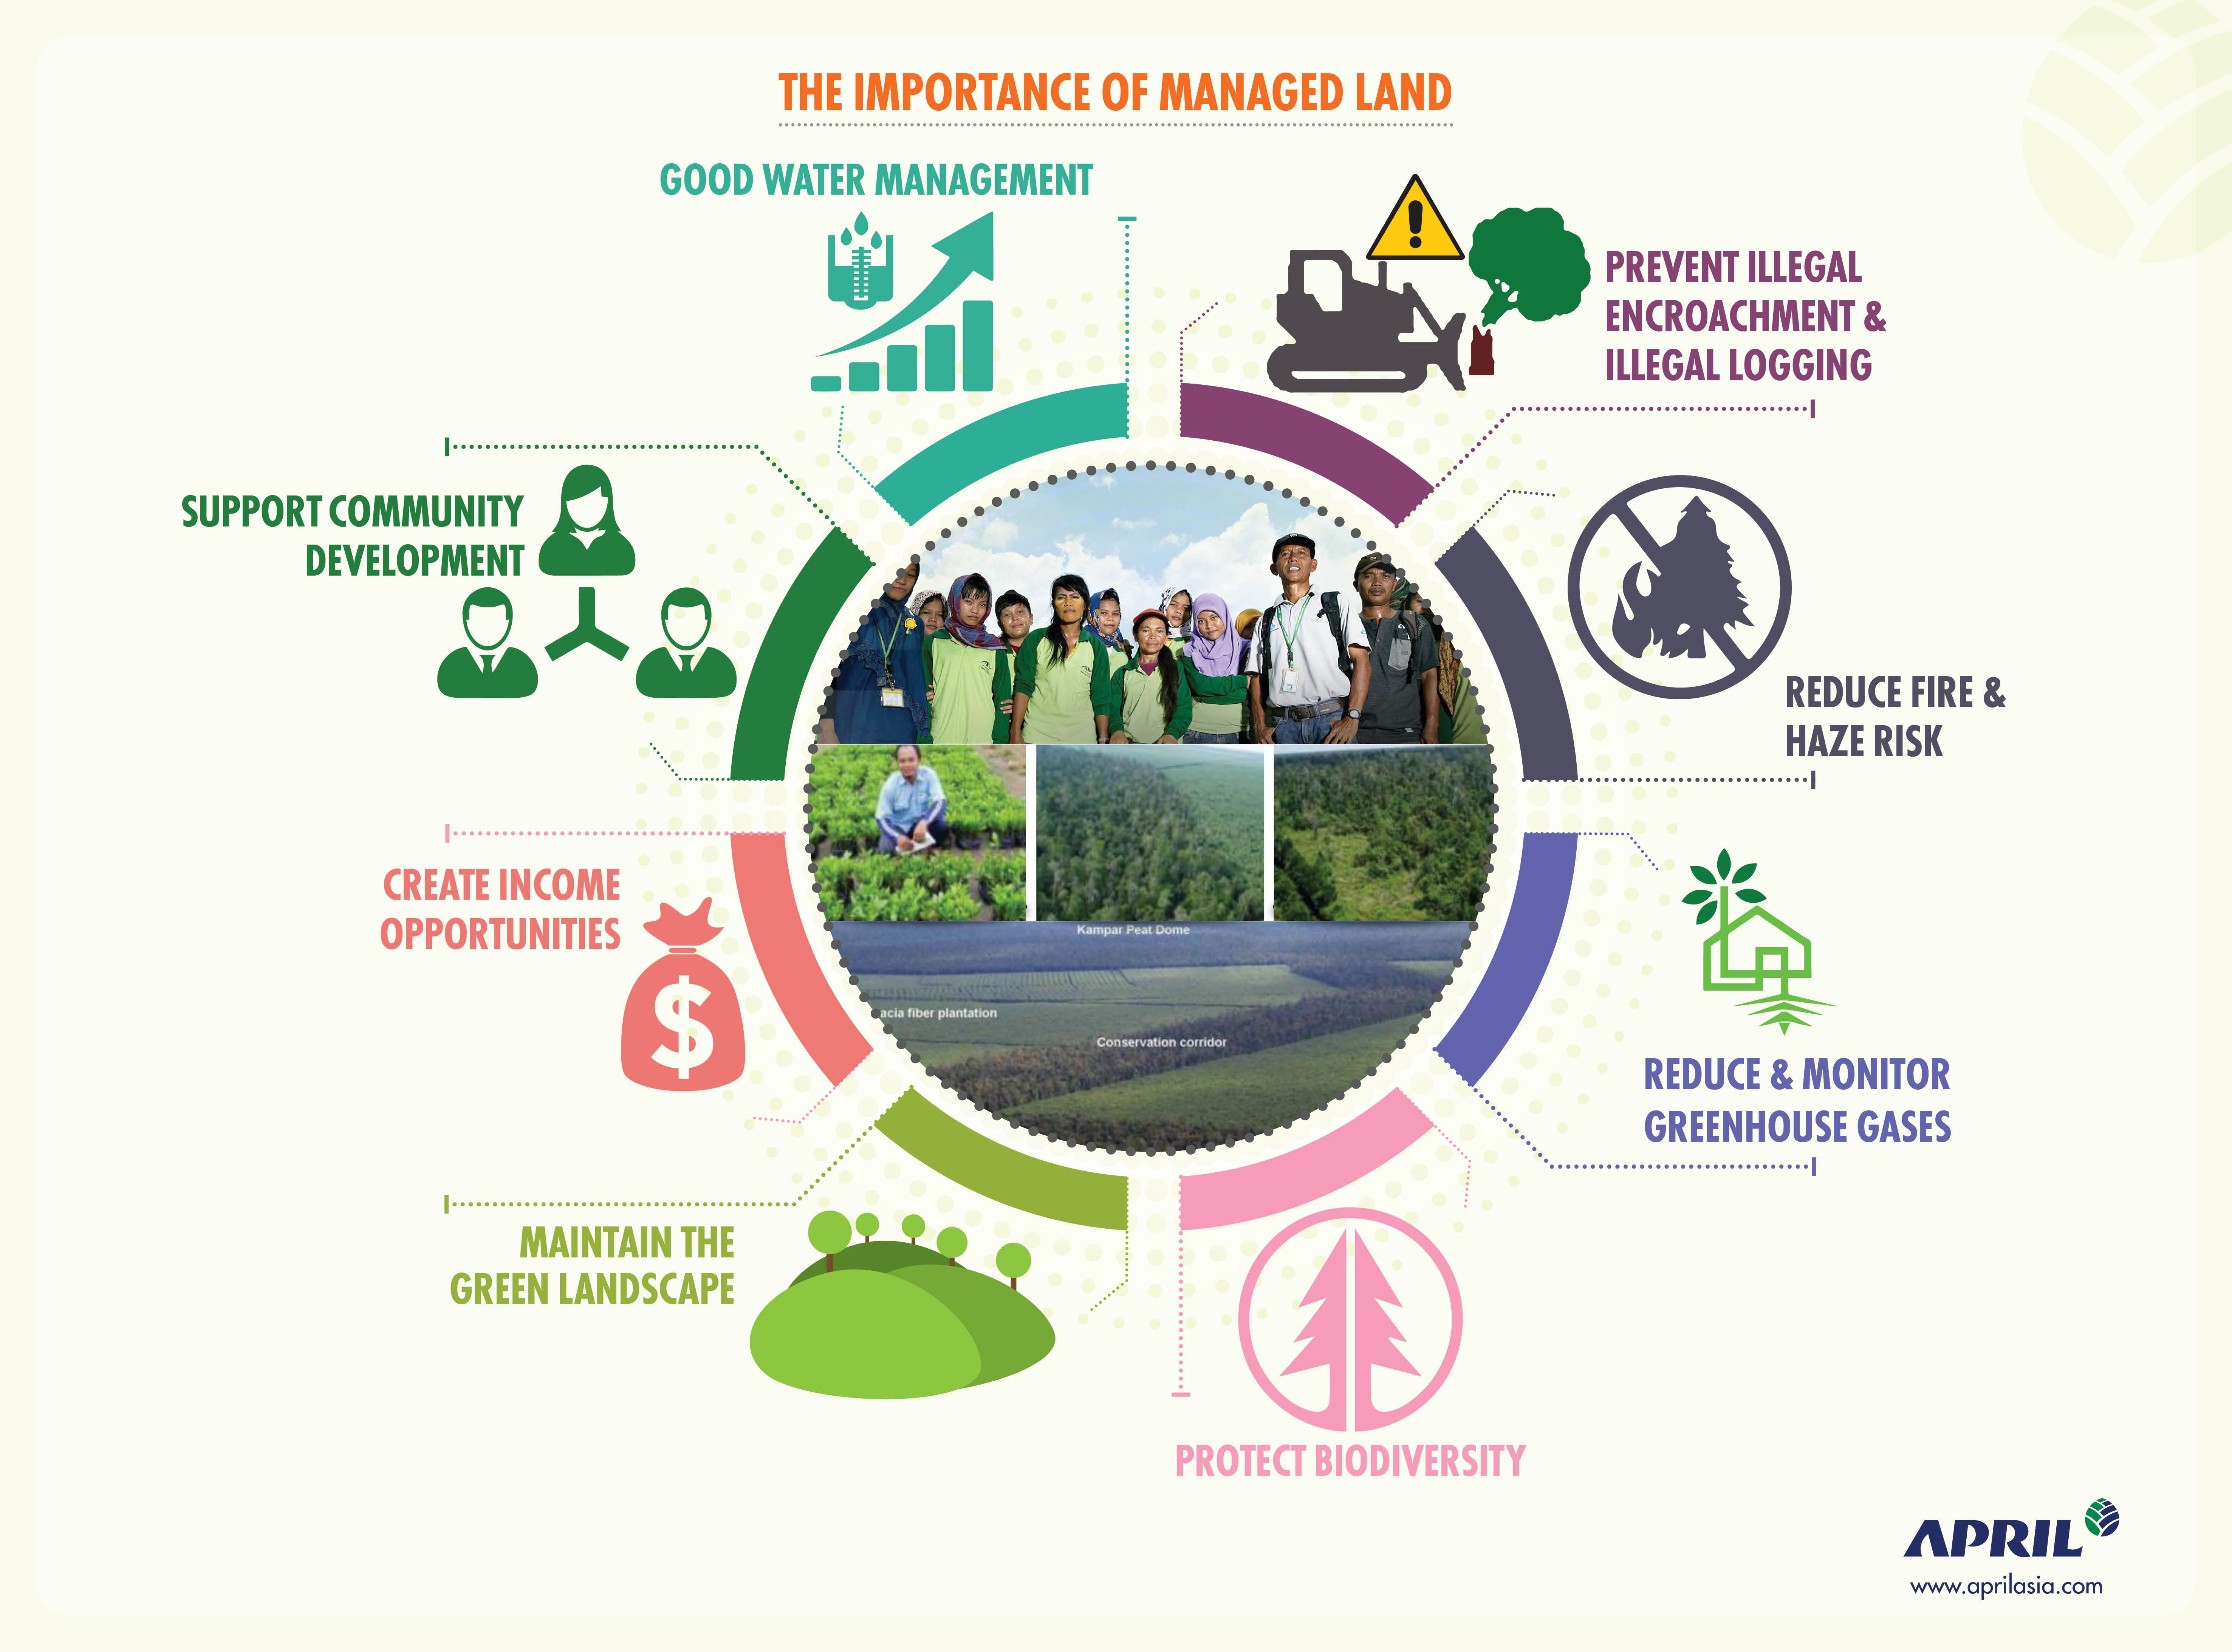 APRIL infographic - Managed lands